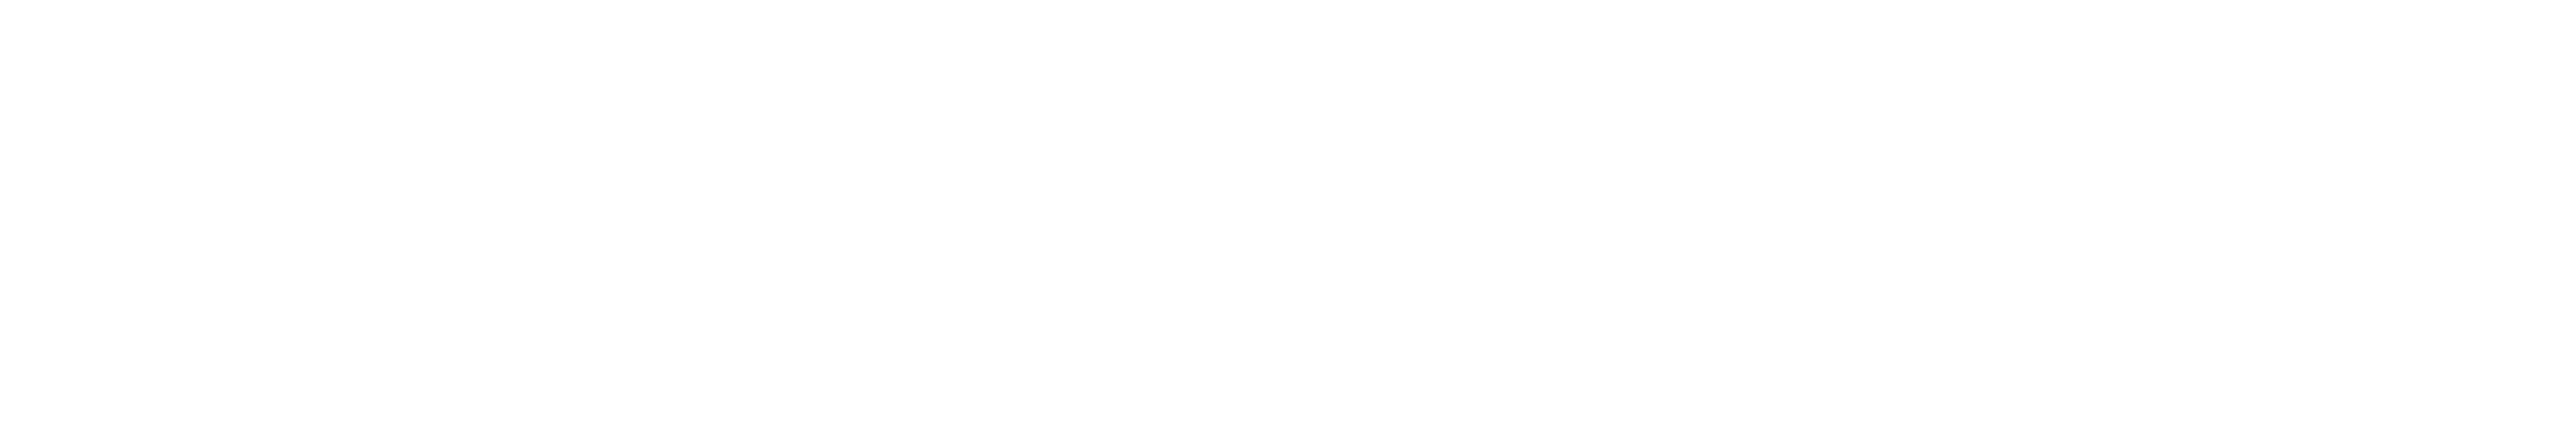 Idle Tuesdays Recording Studio